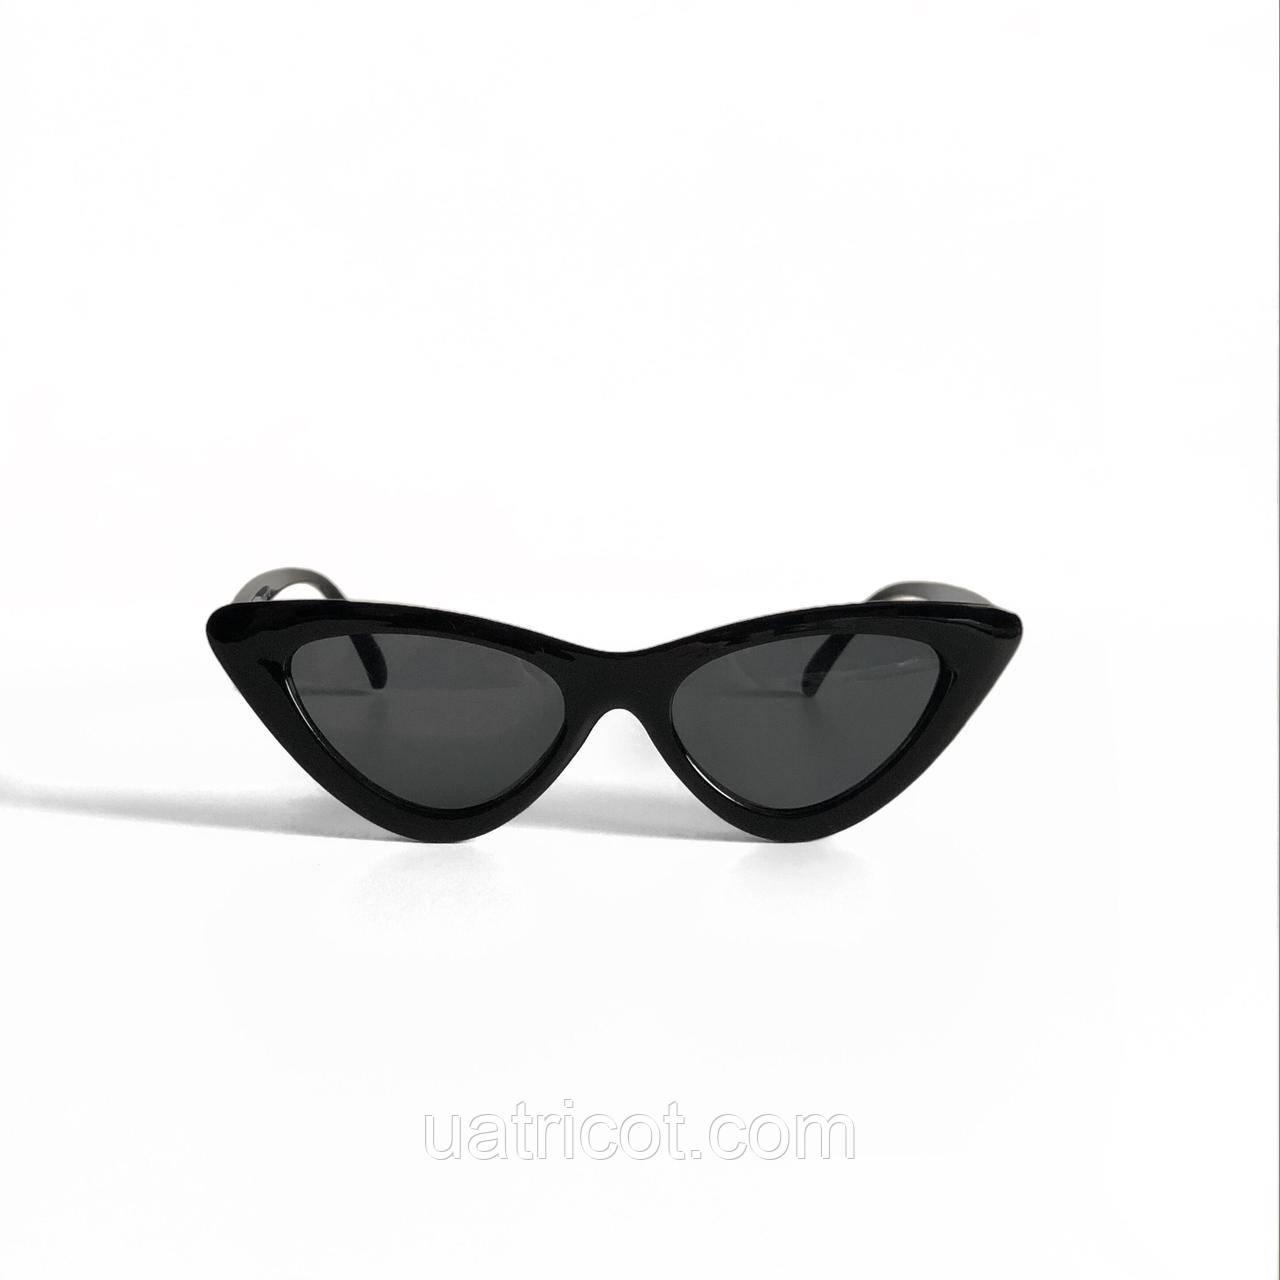 Женские солнцезащитные очки лисички MAX POLO